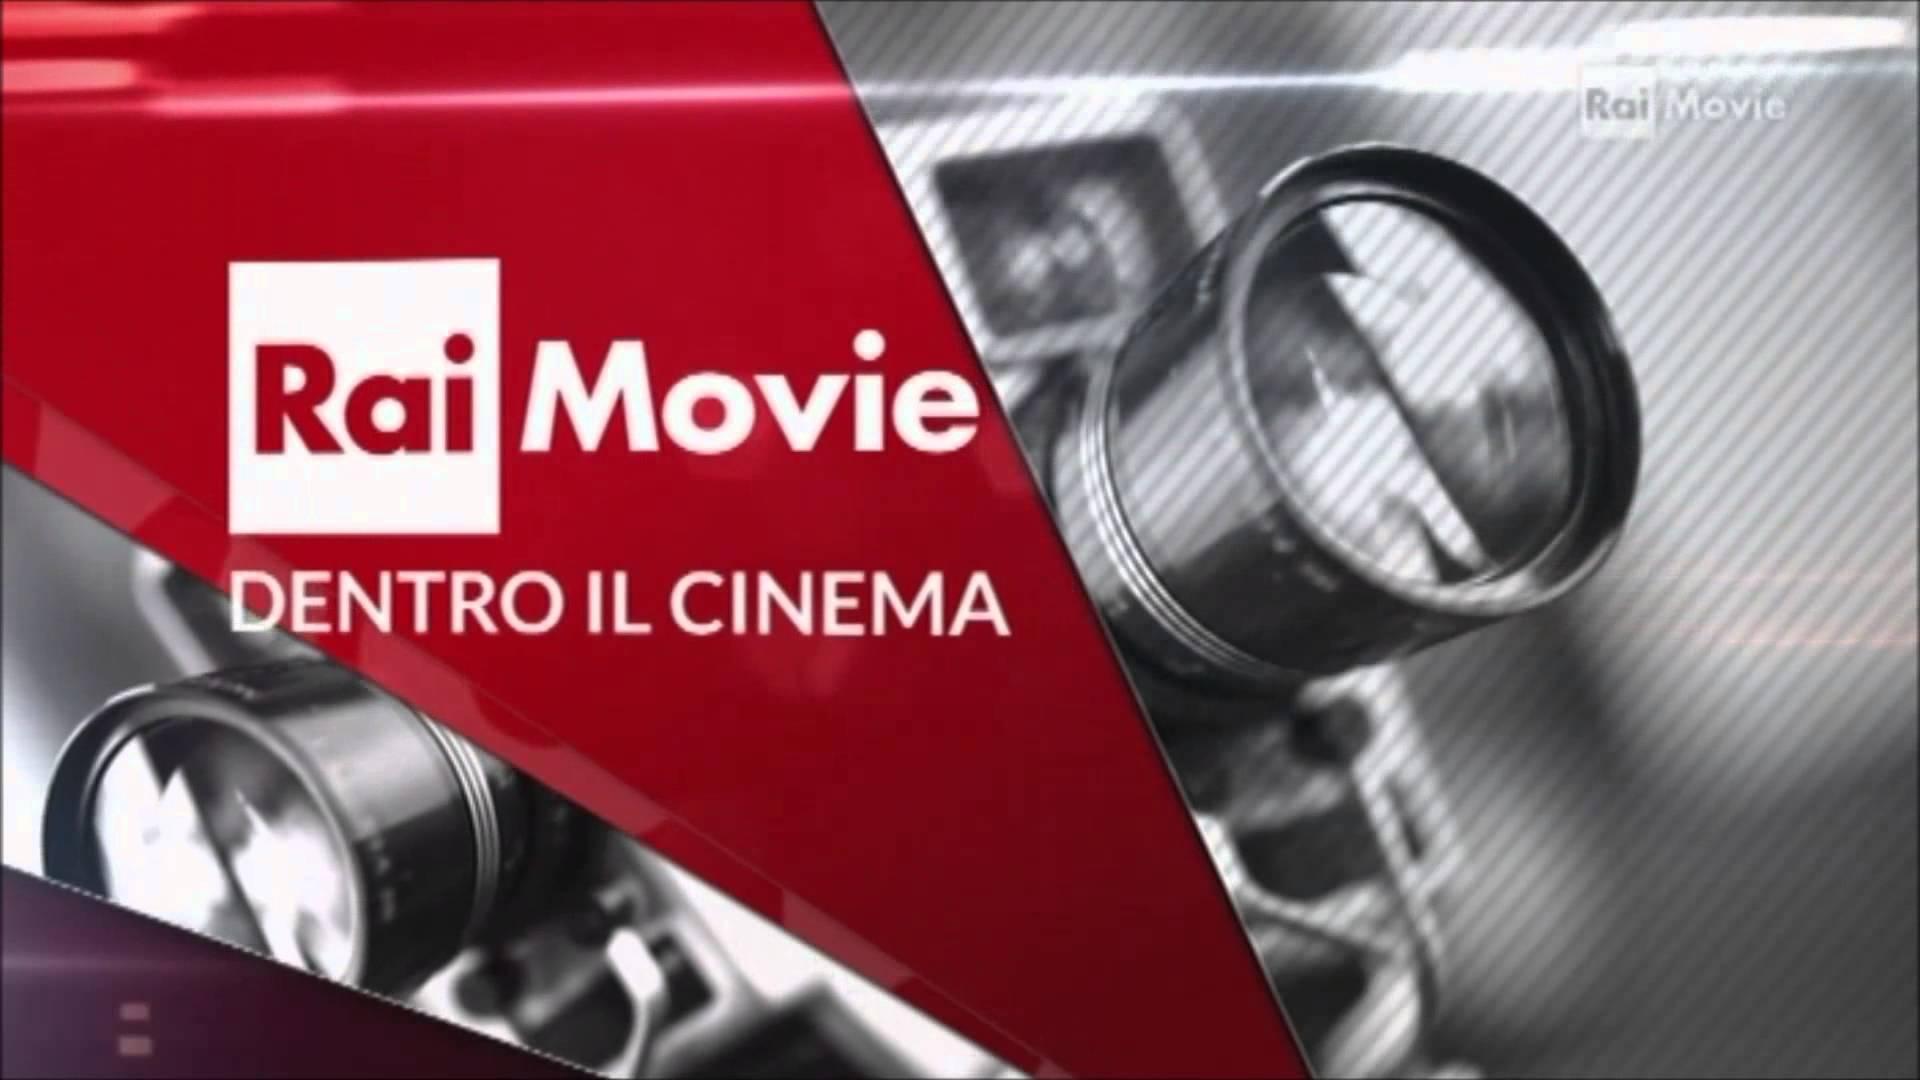 Rai Movie come Netflix? Novità